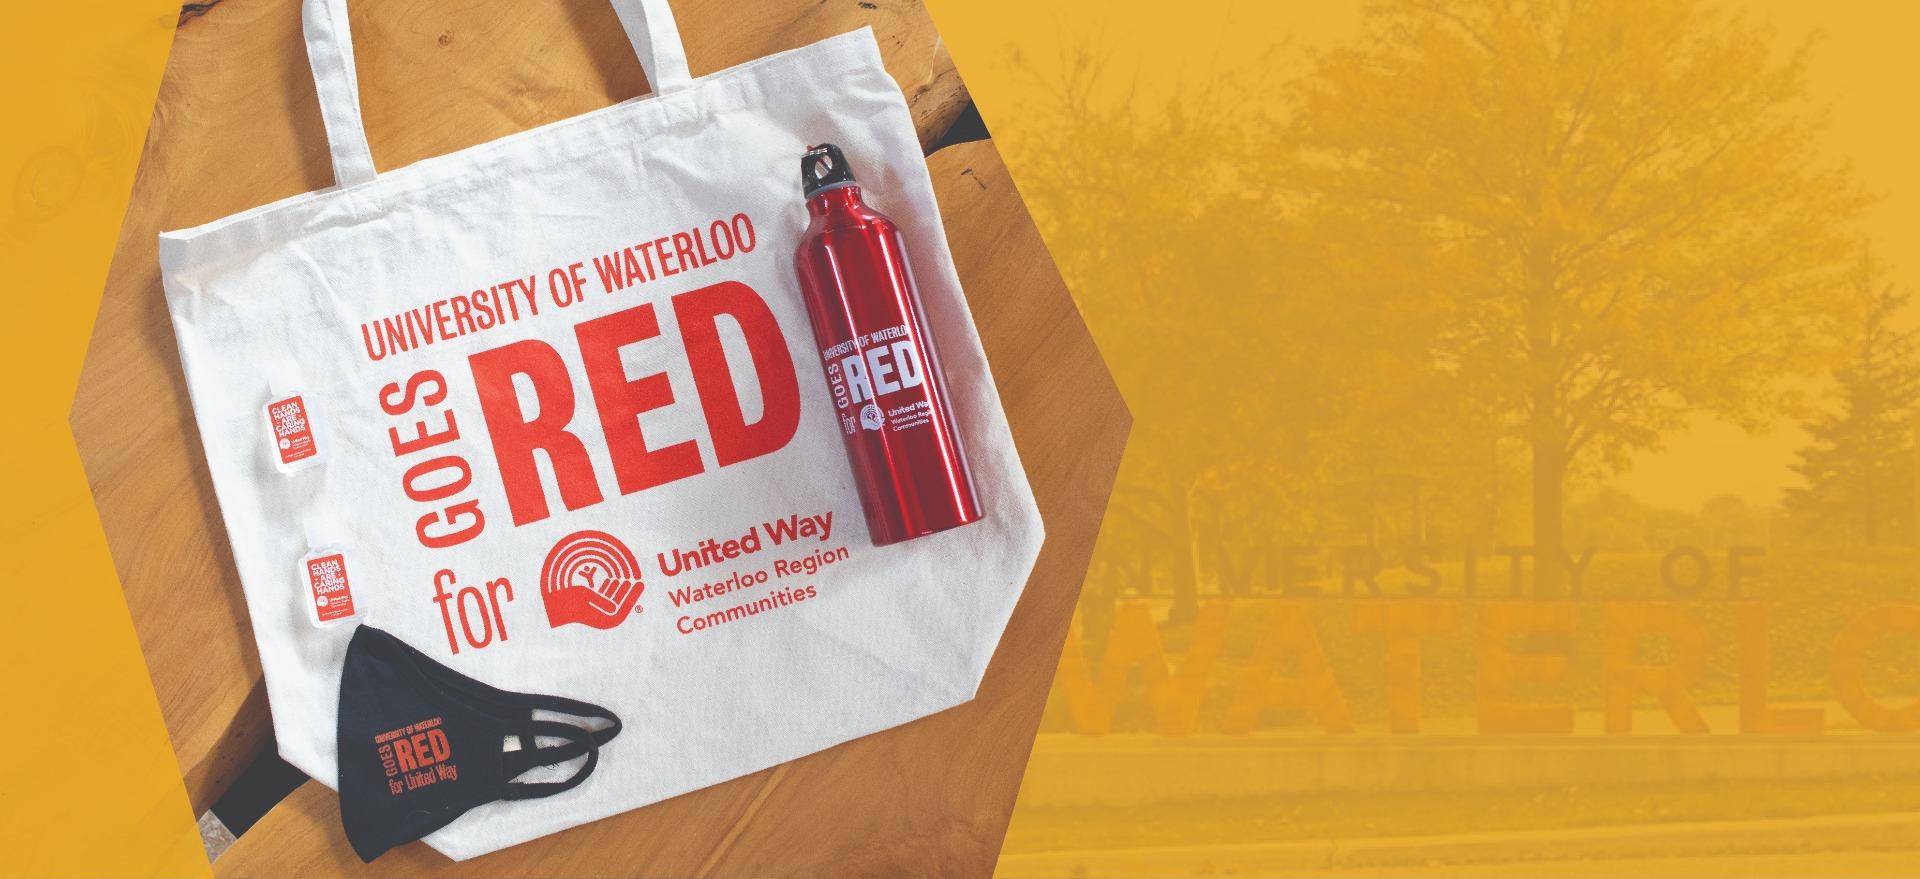 United Way bundle, including tote bag, water bottle, hand sanitizer and face mask